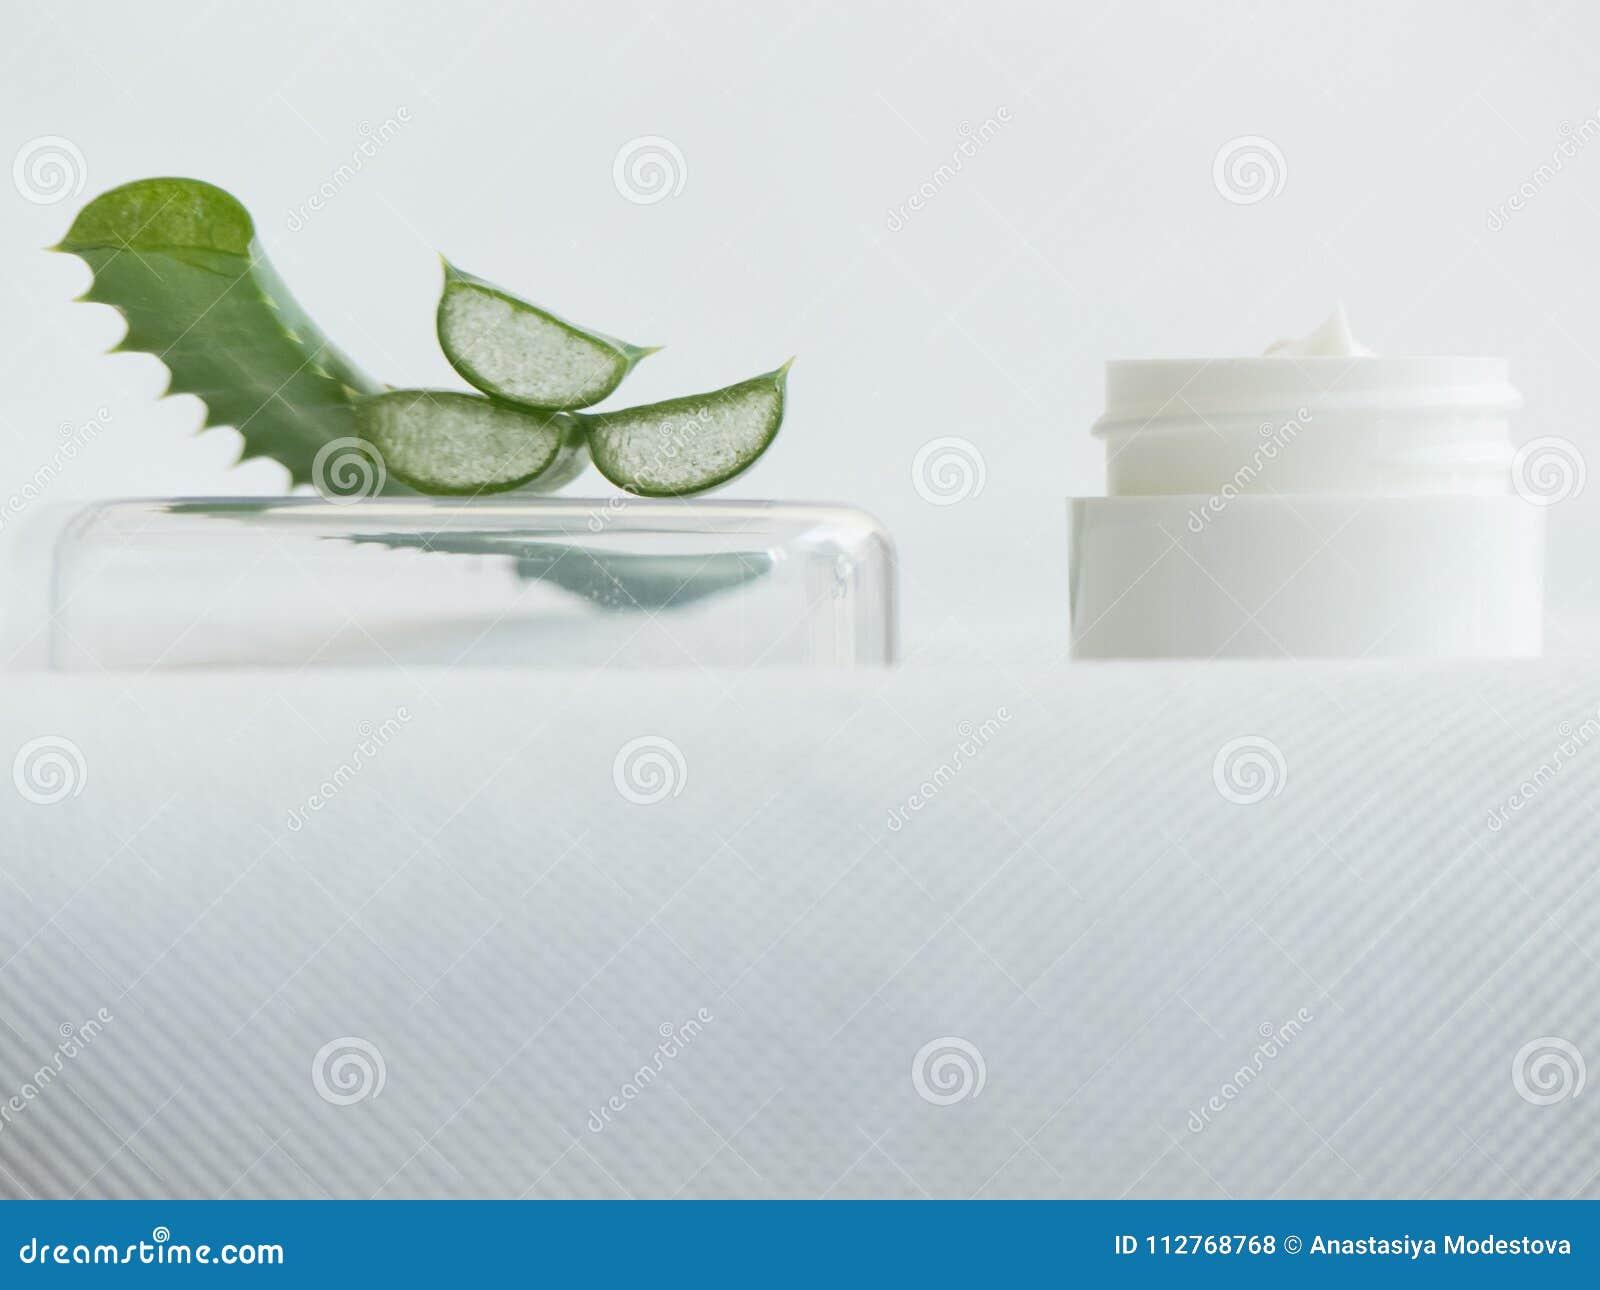 Close up aloe vera slices white cream jar